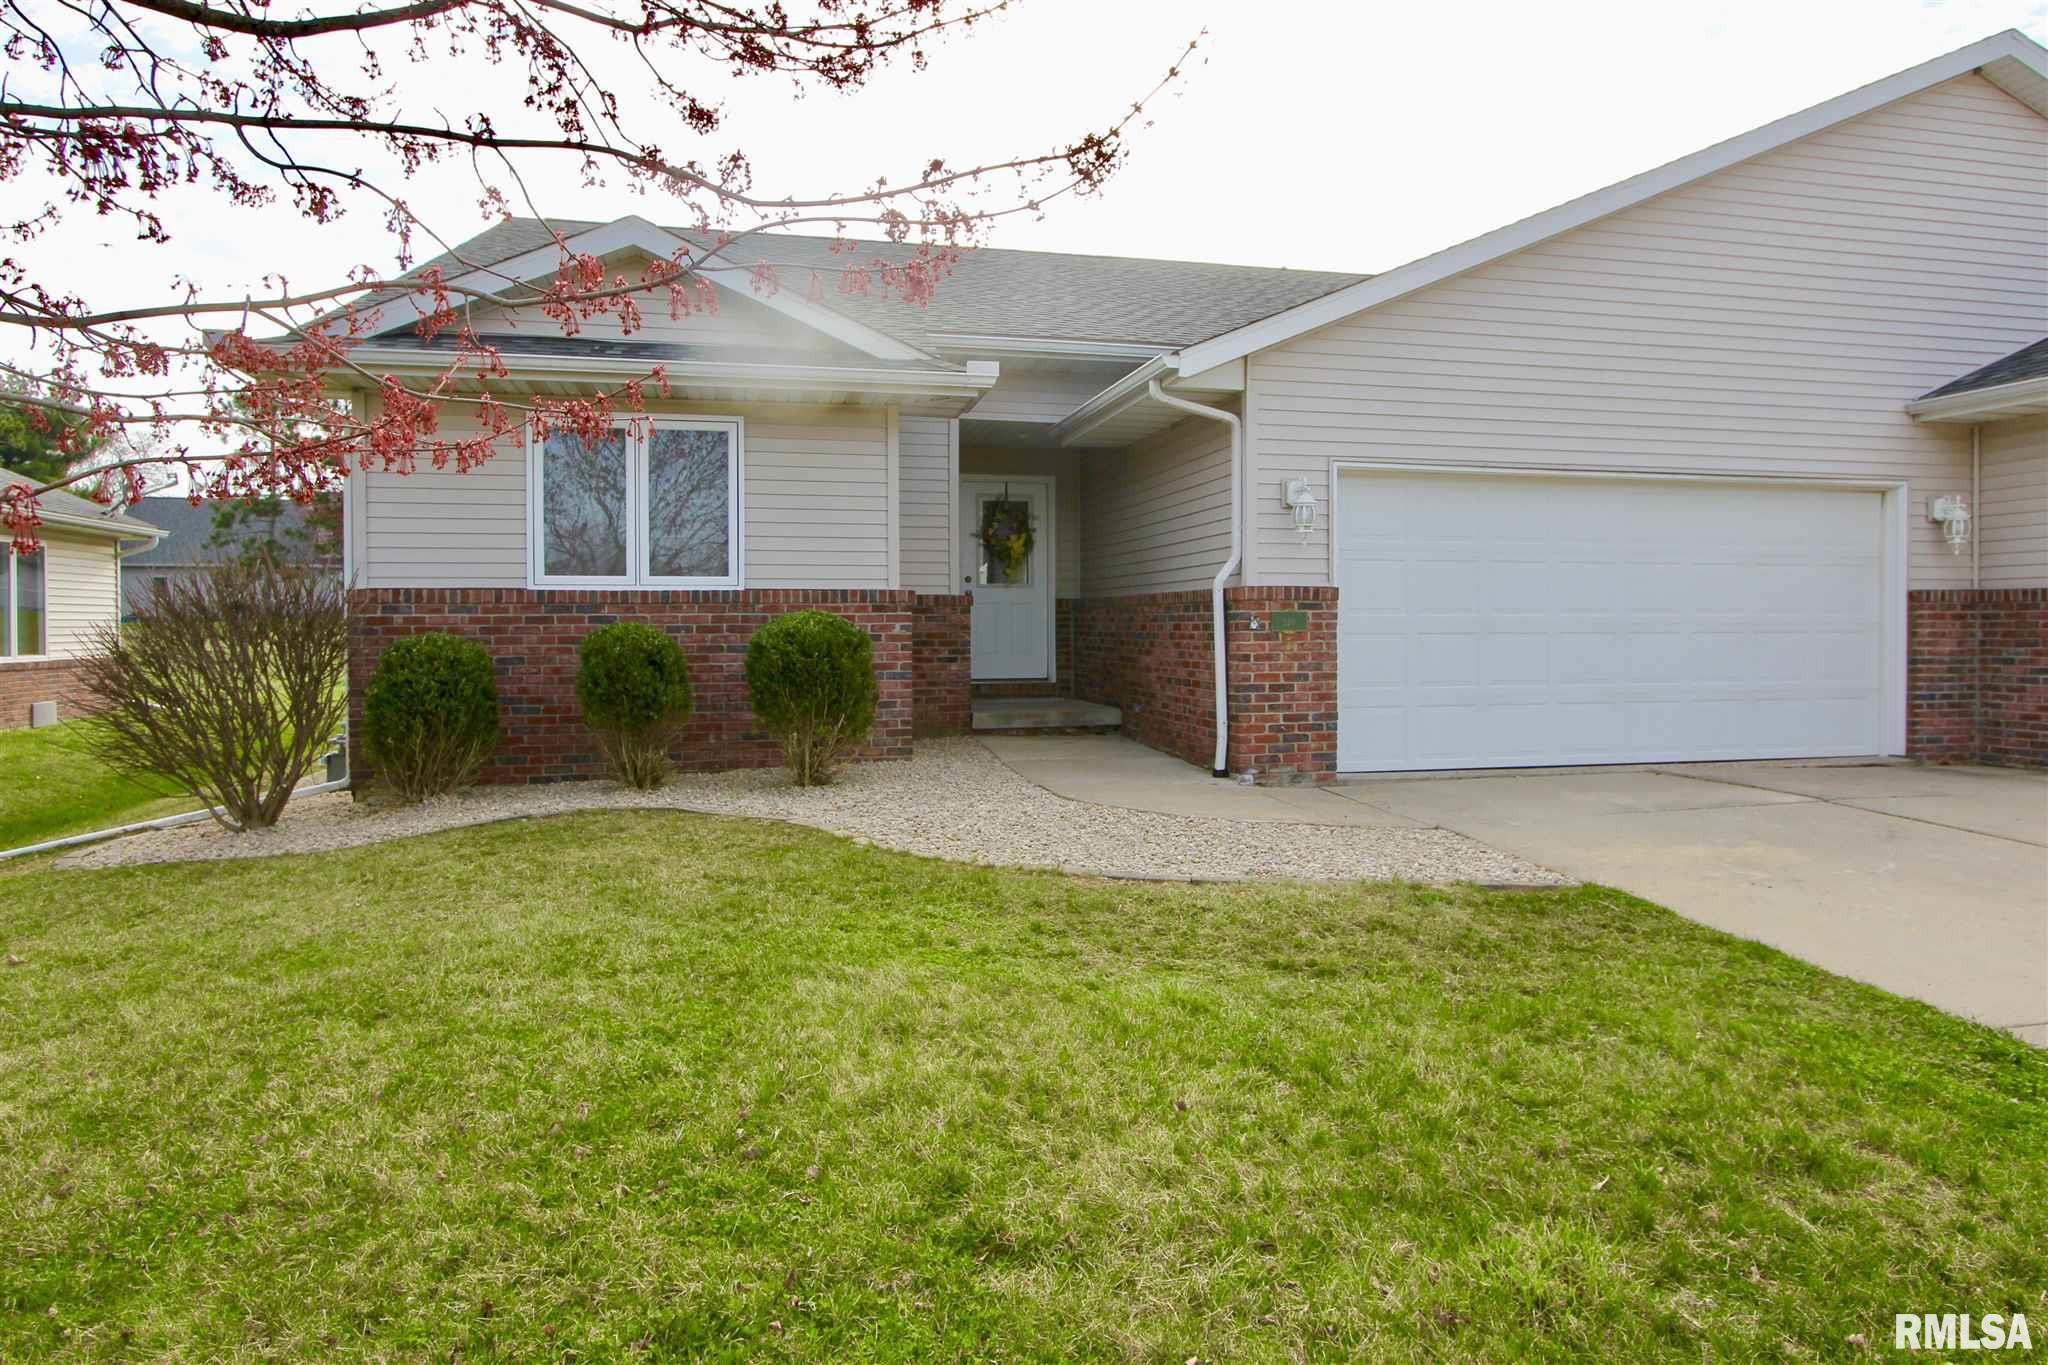 520 N BRAD Property Photo - Hanna City, IL real estate listing